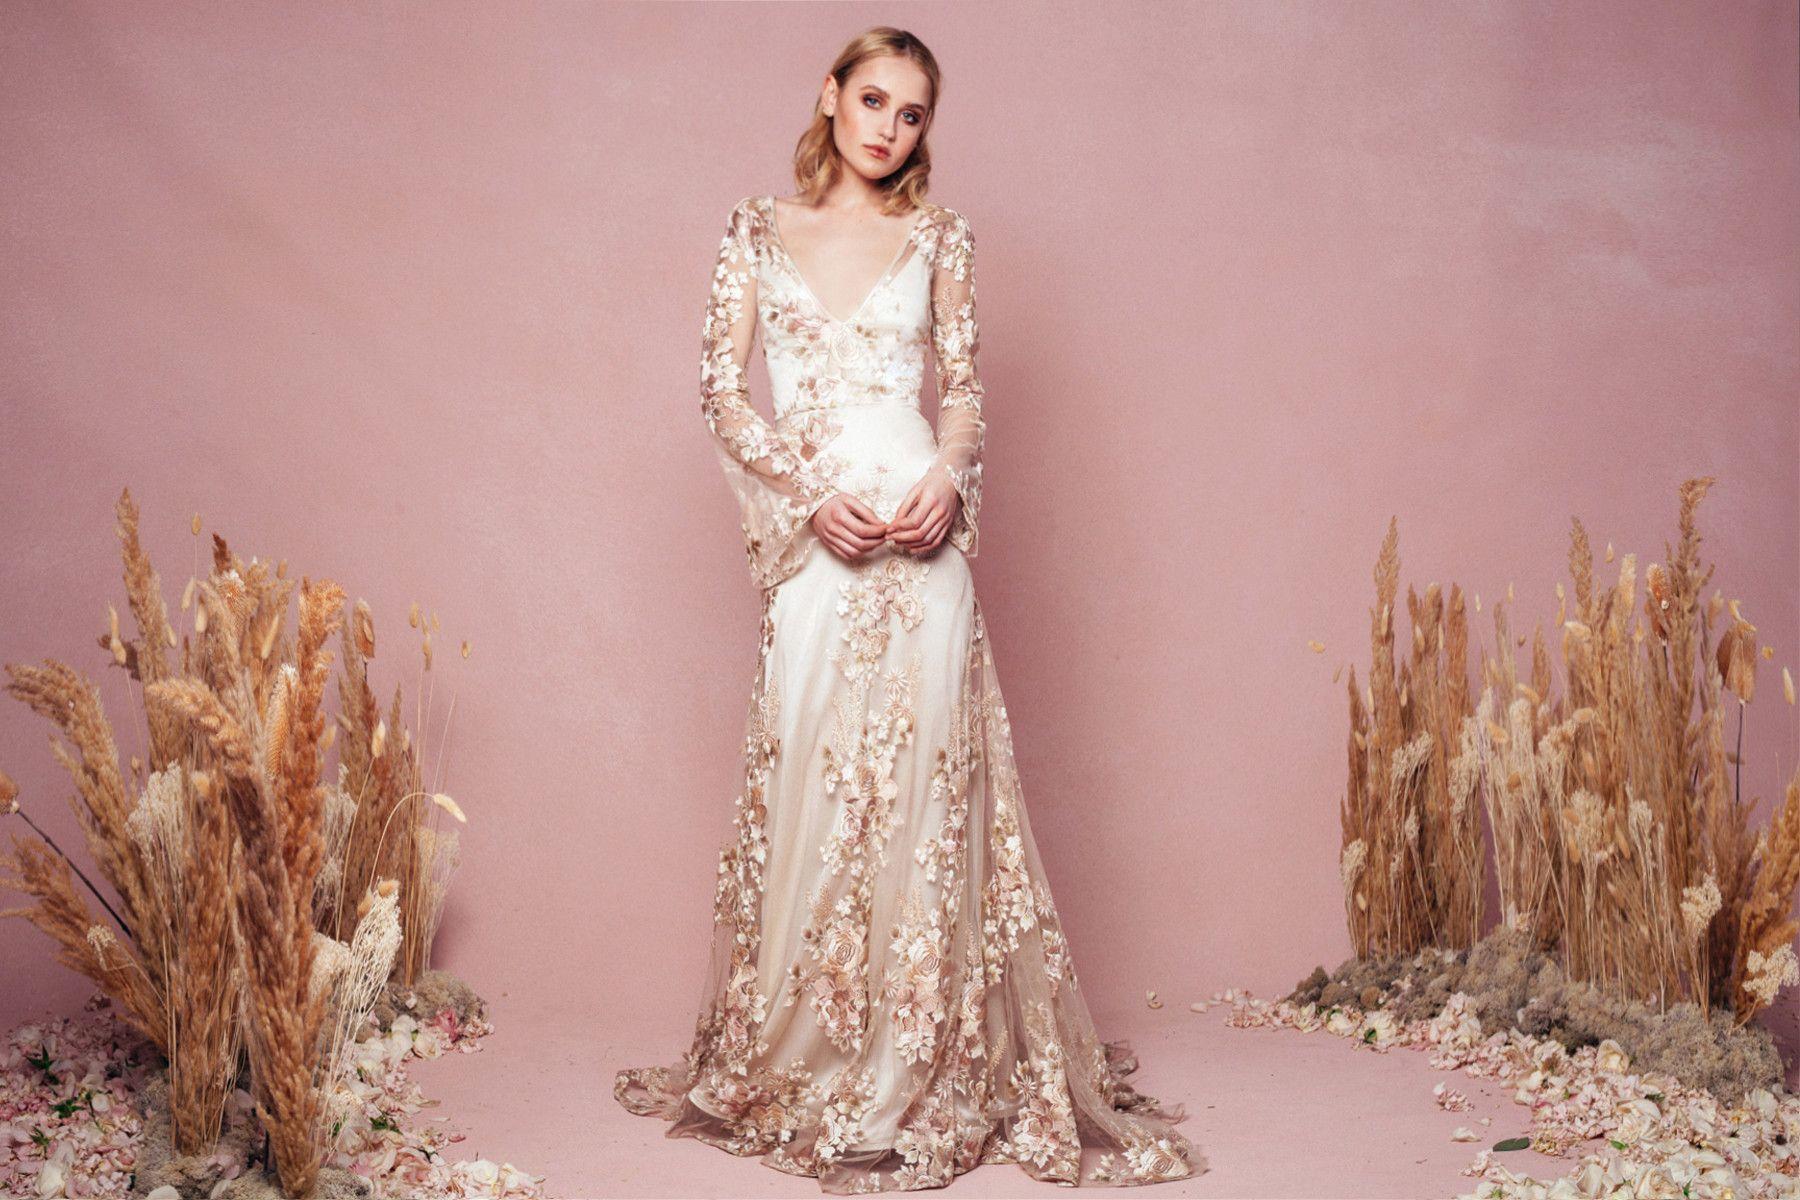 THE ALYSE GOWN – Odylyne the Ceremony | wedding dress inspo | Pinterest